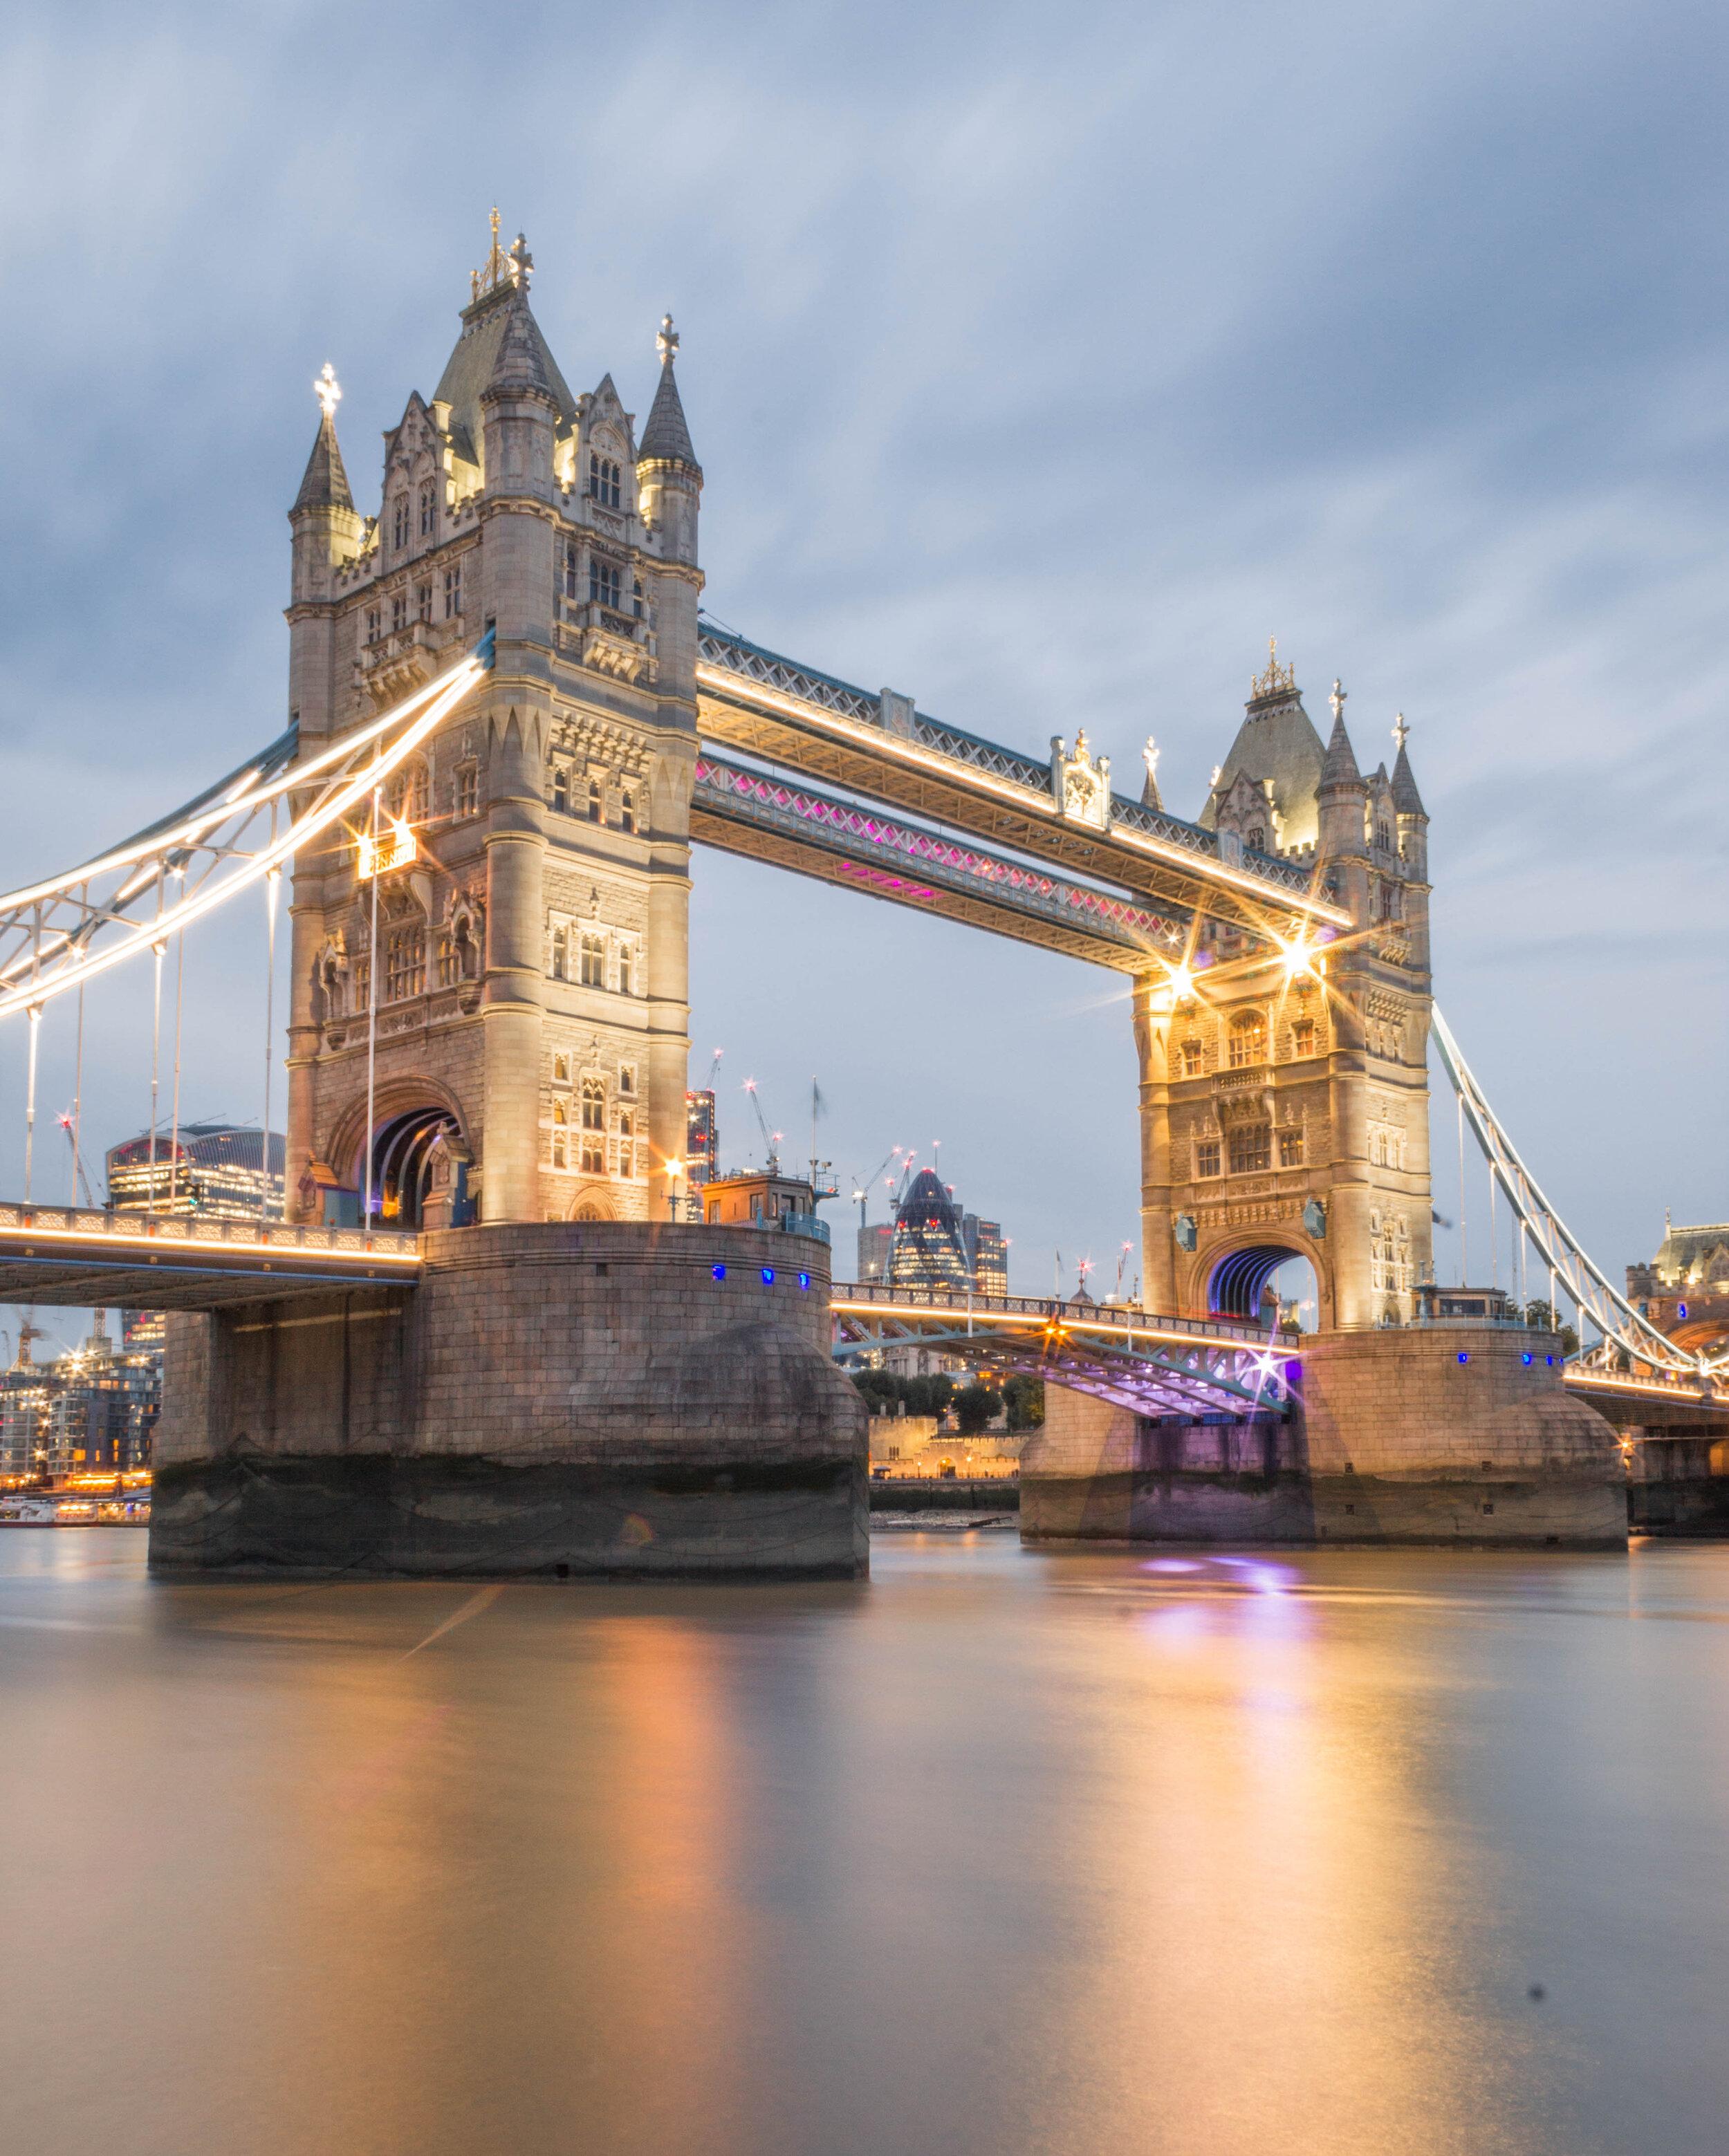 Belinda_Jiao_London_UK (Copy)